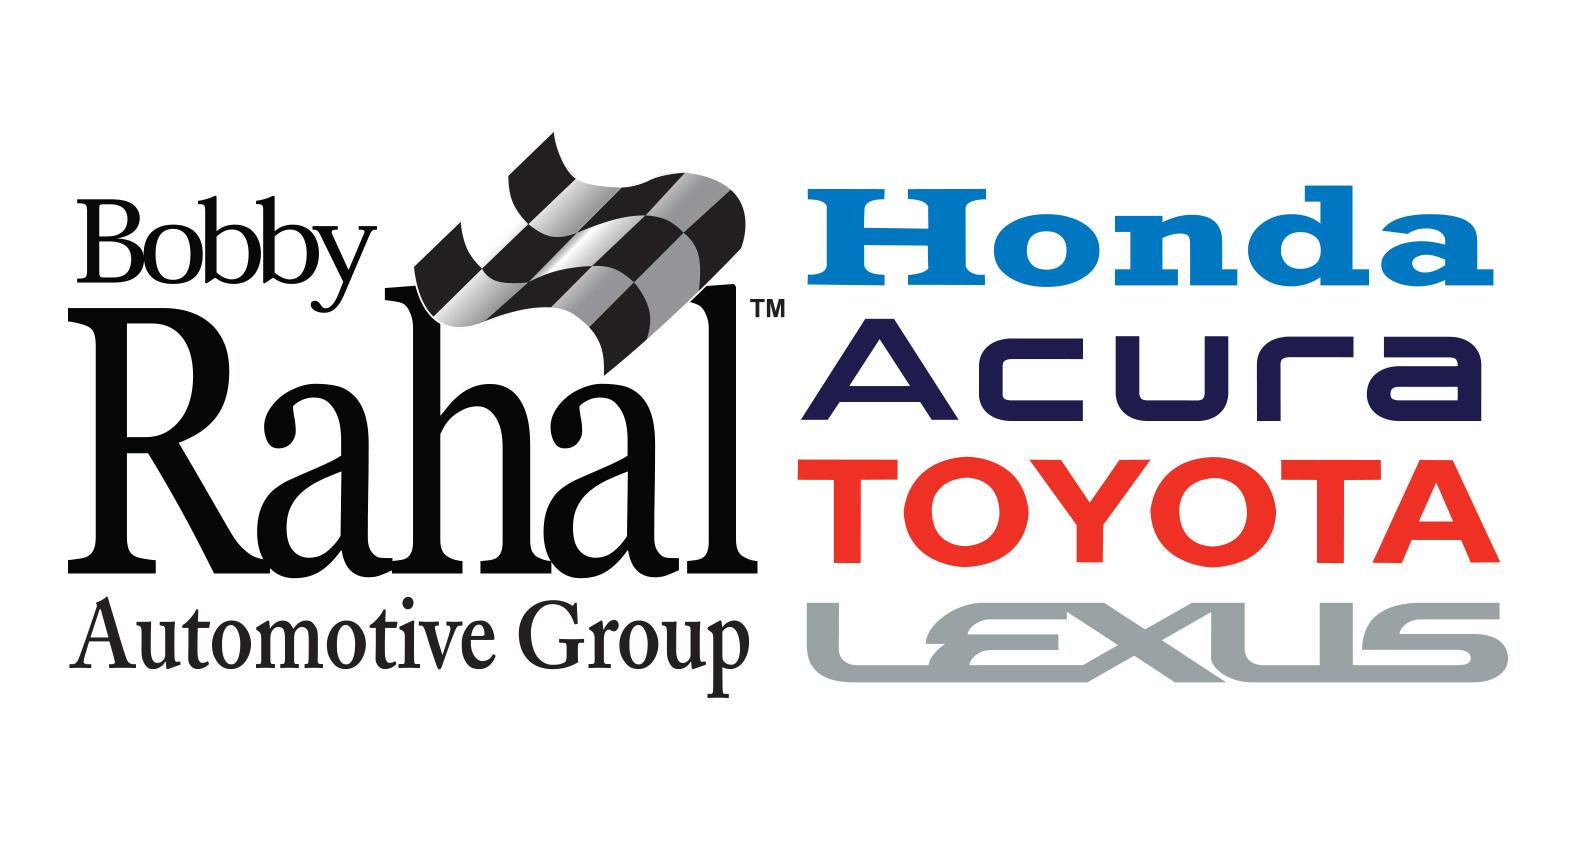 Bobby Rahal Auto Group Logos